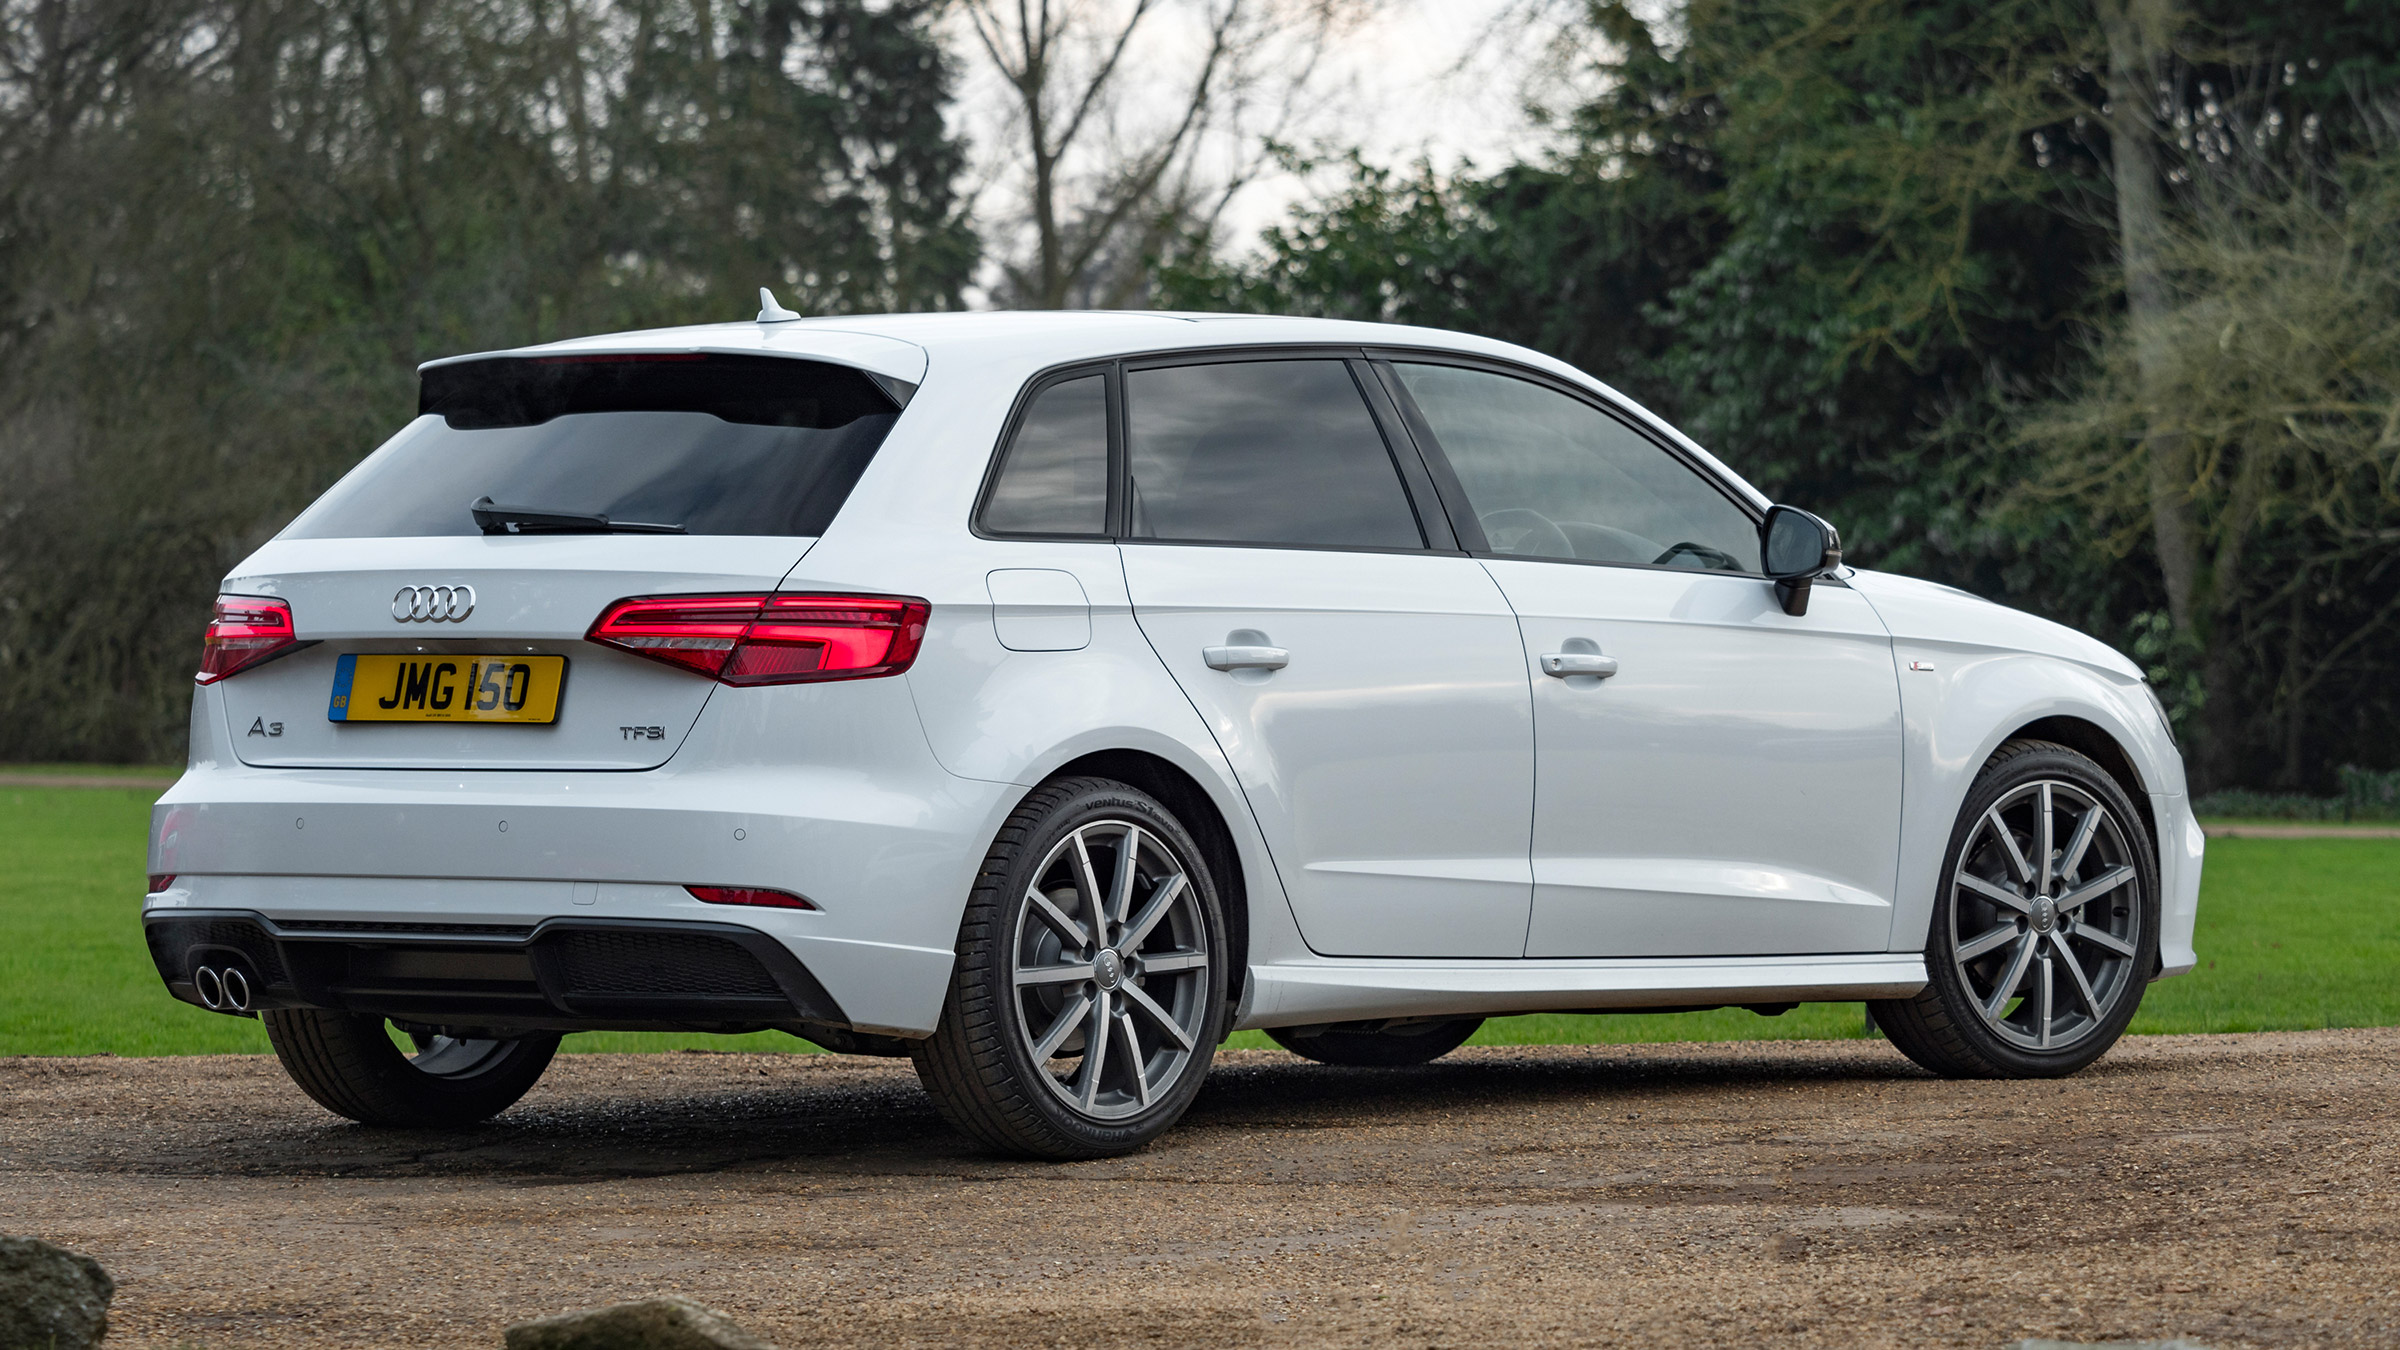 Kekurangan Audi A3 Hatchback 2019 Tangguh